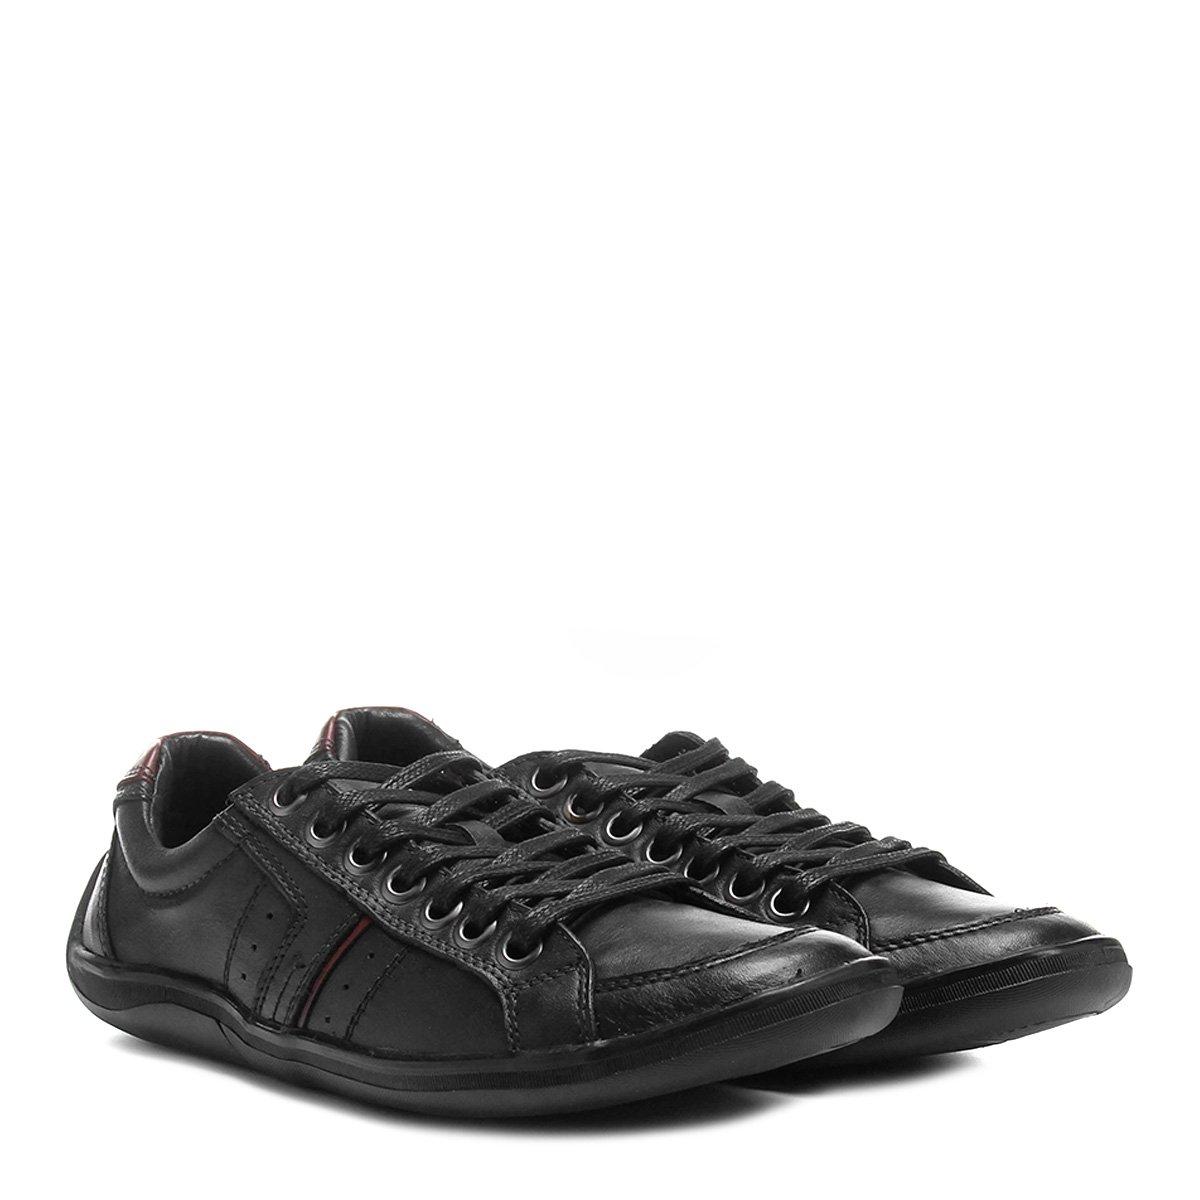 b8c153f3fbd1b ... Sapatênis Couro Shoestock Masculino - Compre Agora Zattini  23b88781b99162 ...